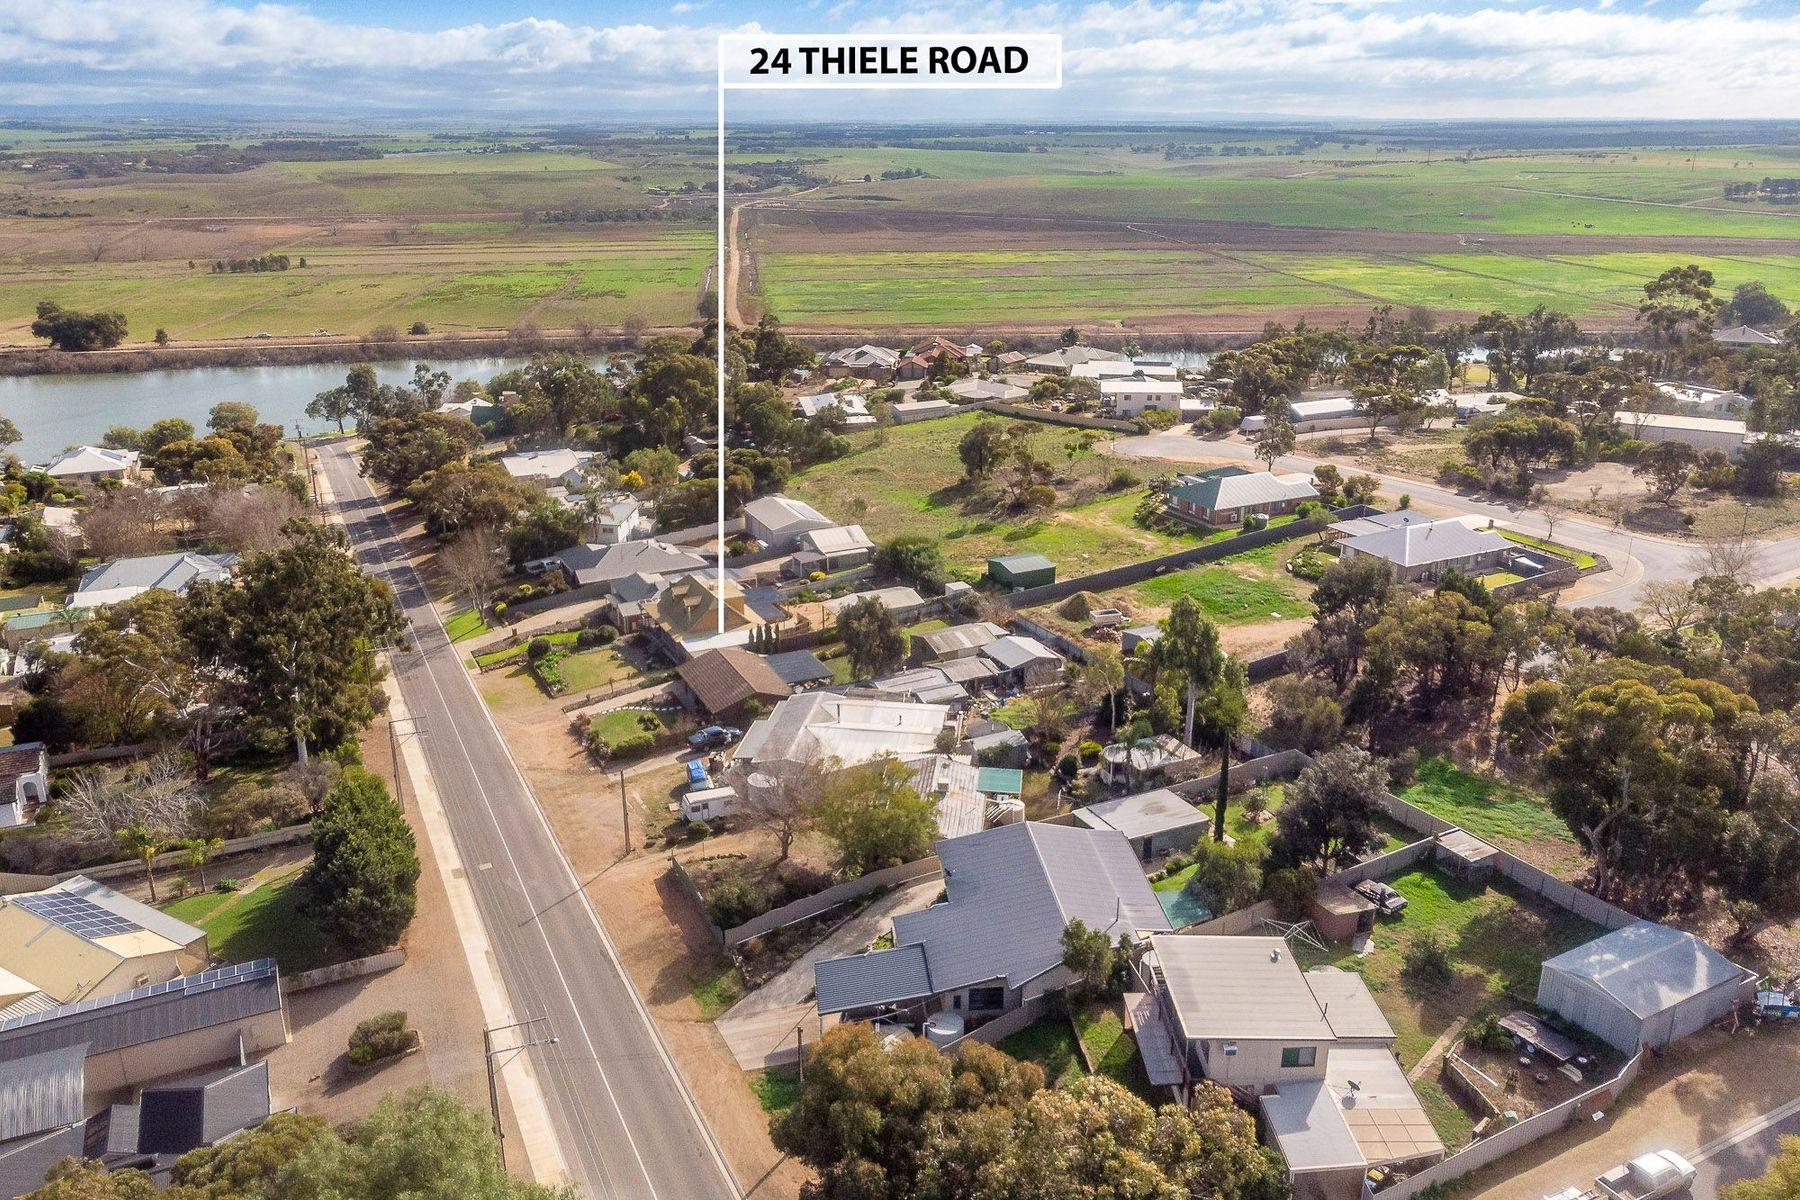 24 Thiele Road, Murray Bridge, SA 5253